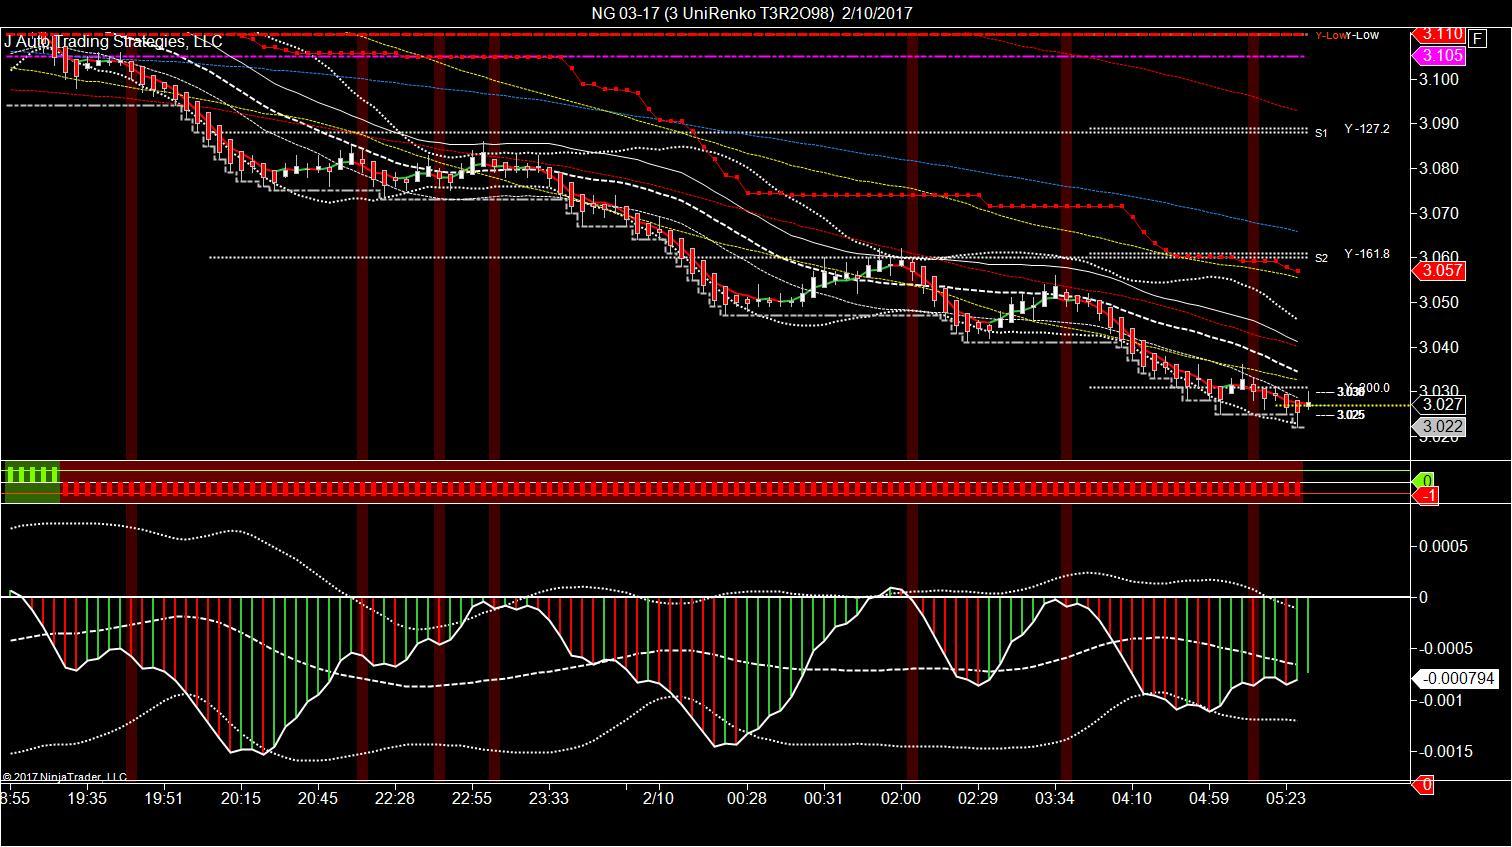 Select trading strategies llc